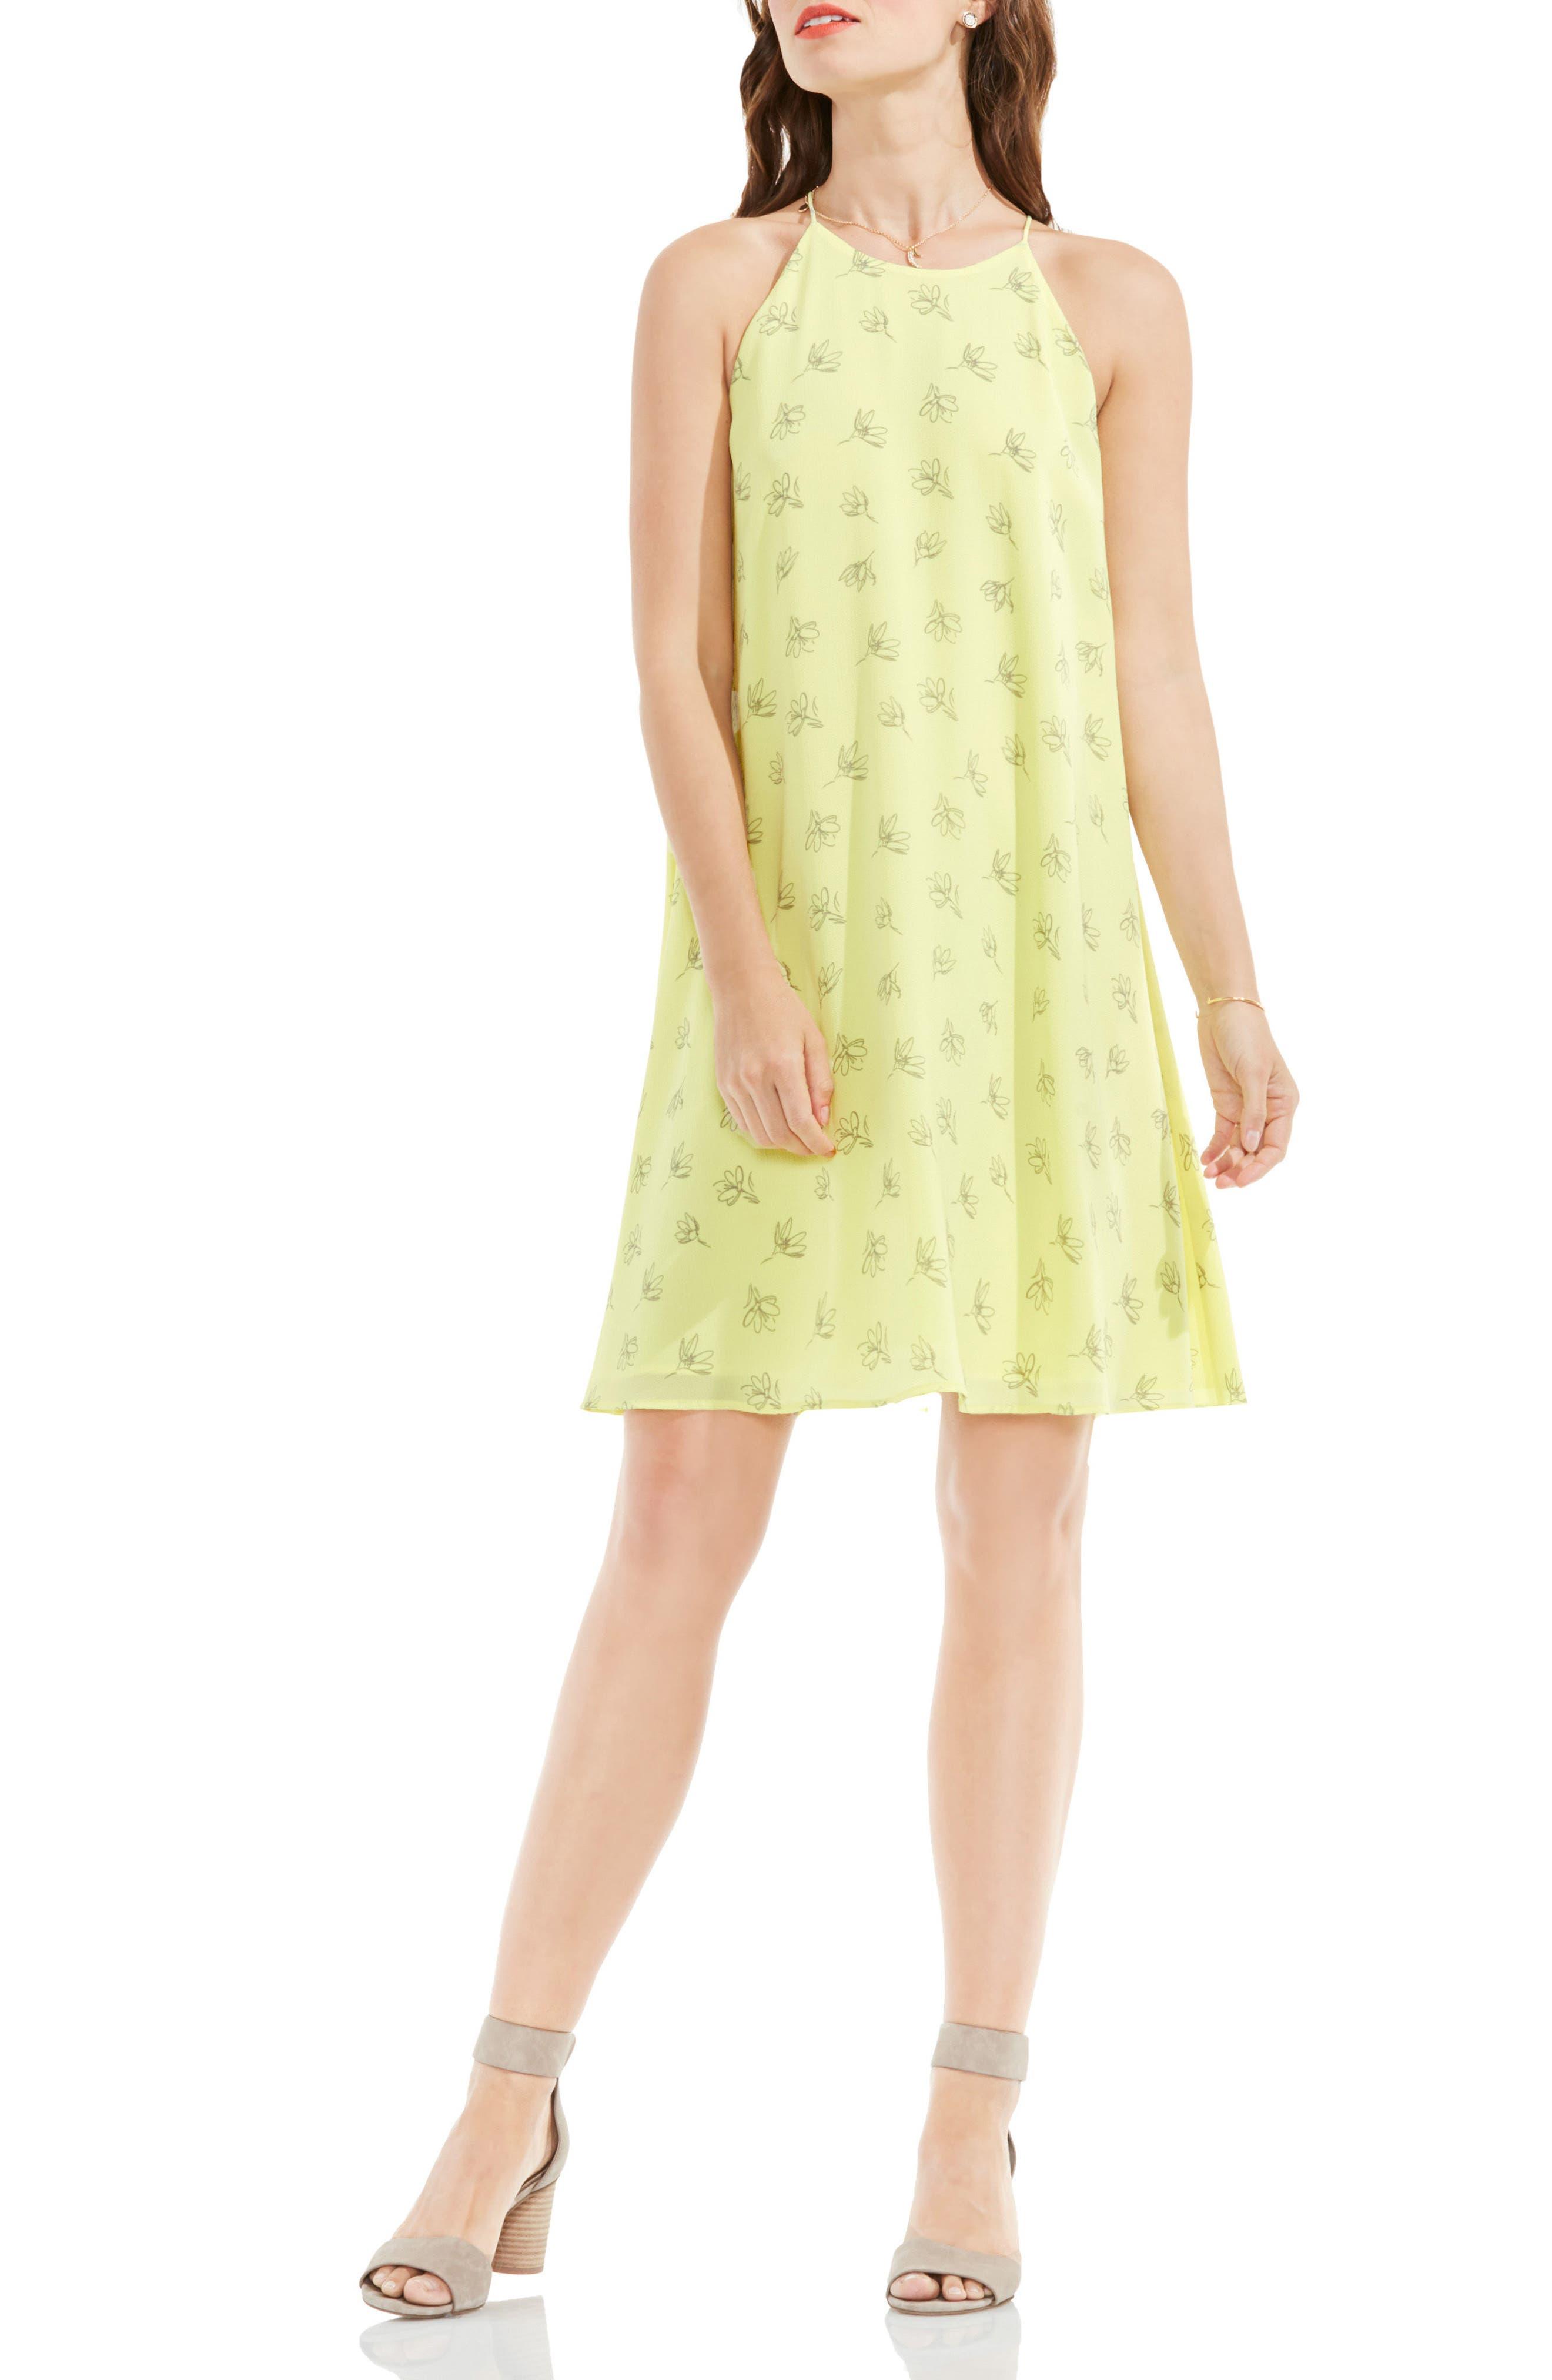 Fluent Flowers Print Sleeveless A-Line Dress,                             Main thumbnail 1, color,                             Key Lime